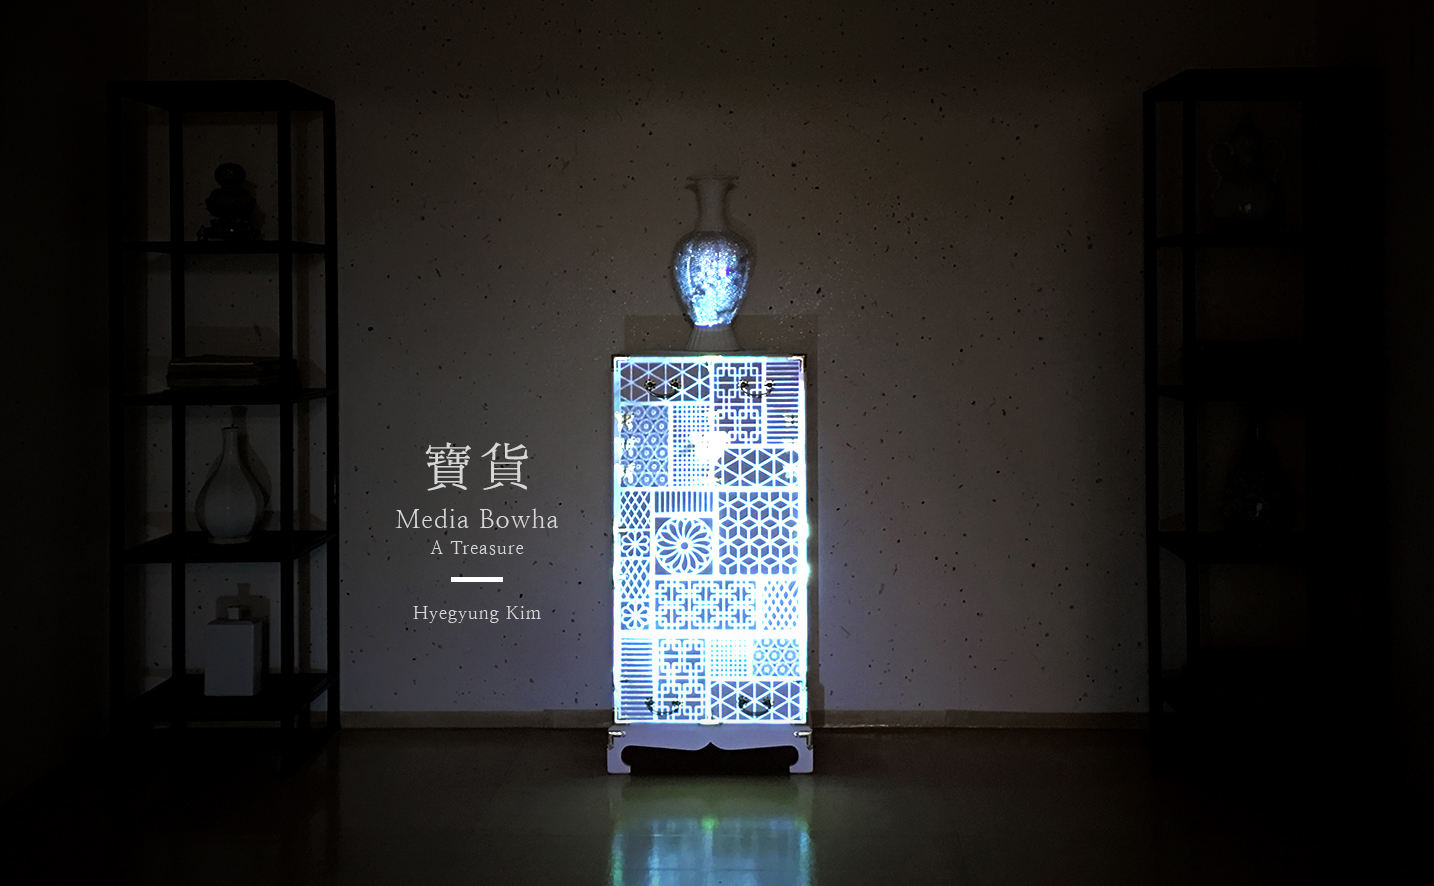 Media Bowha (寶貨 - A Treasure) Installation, 2016